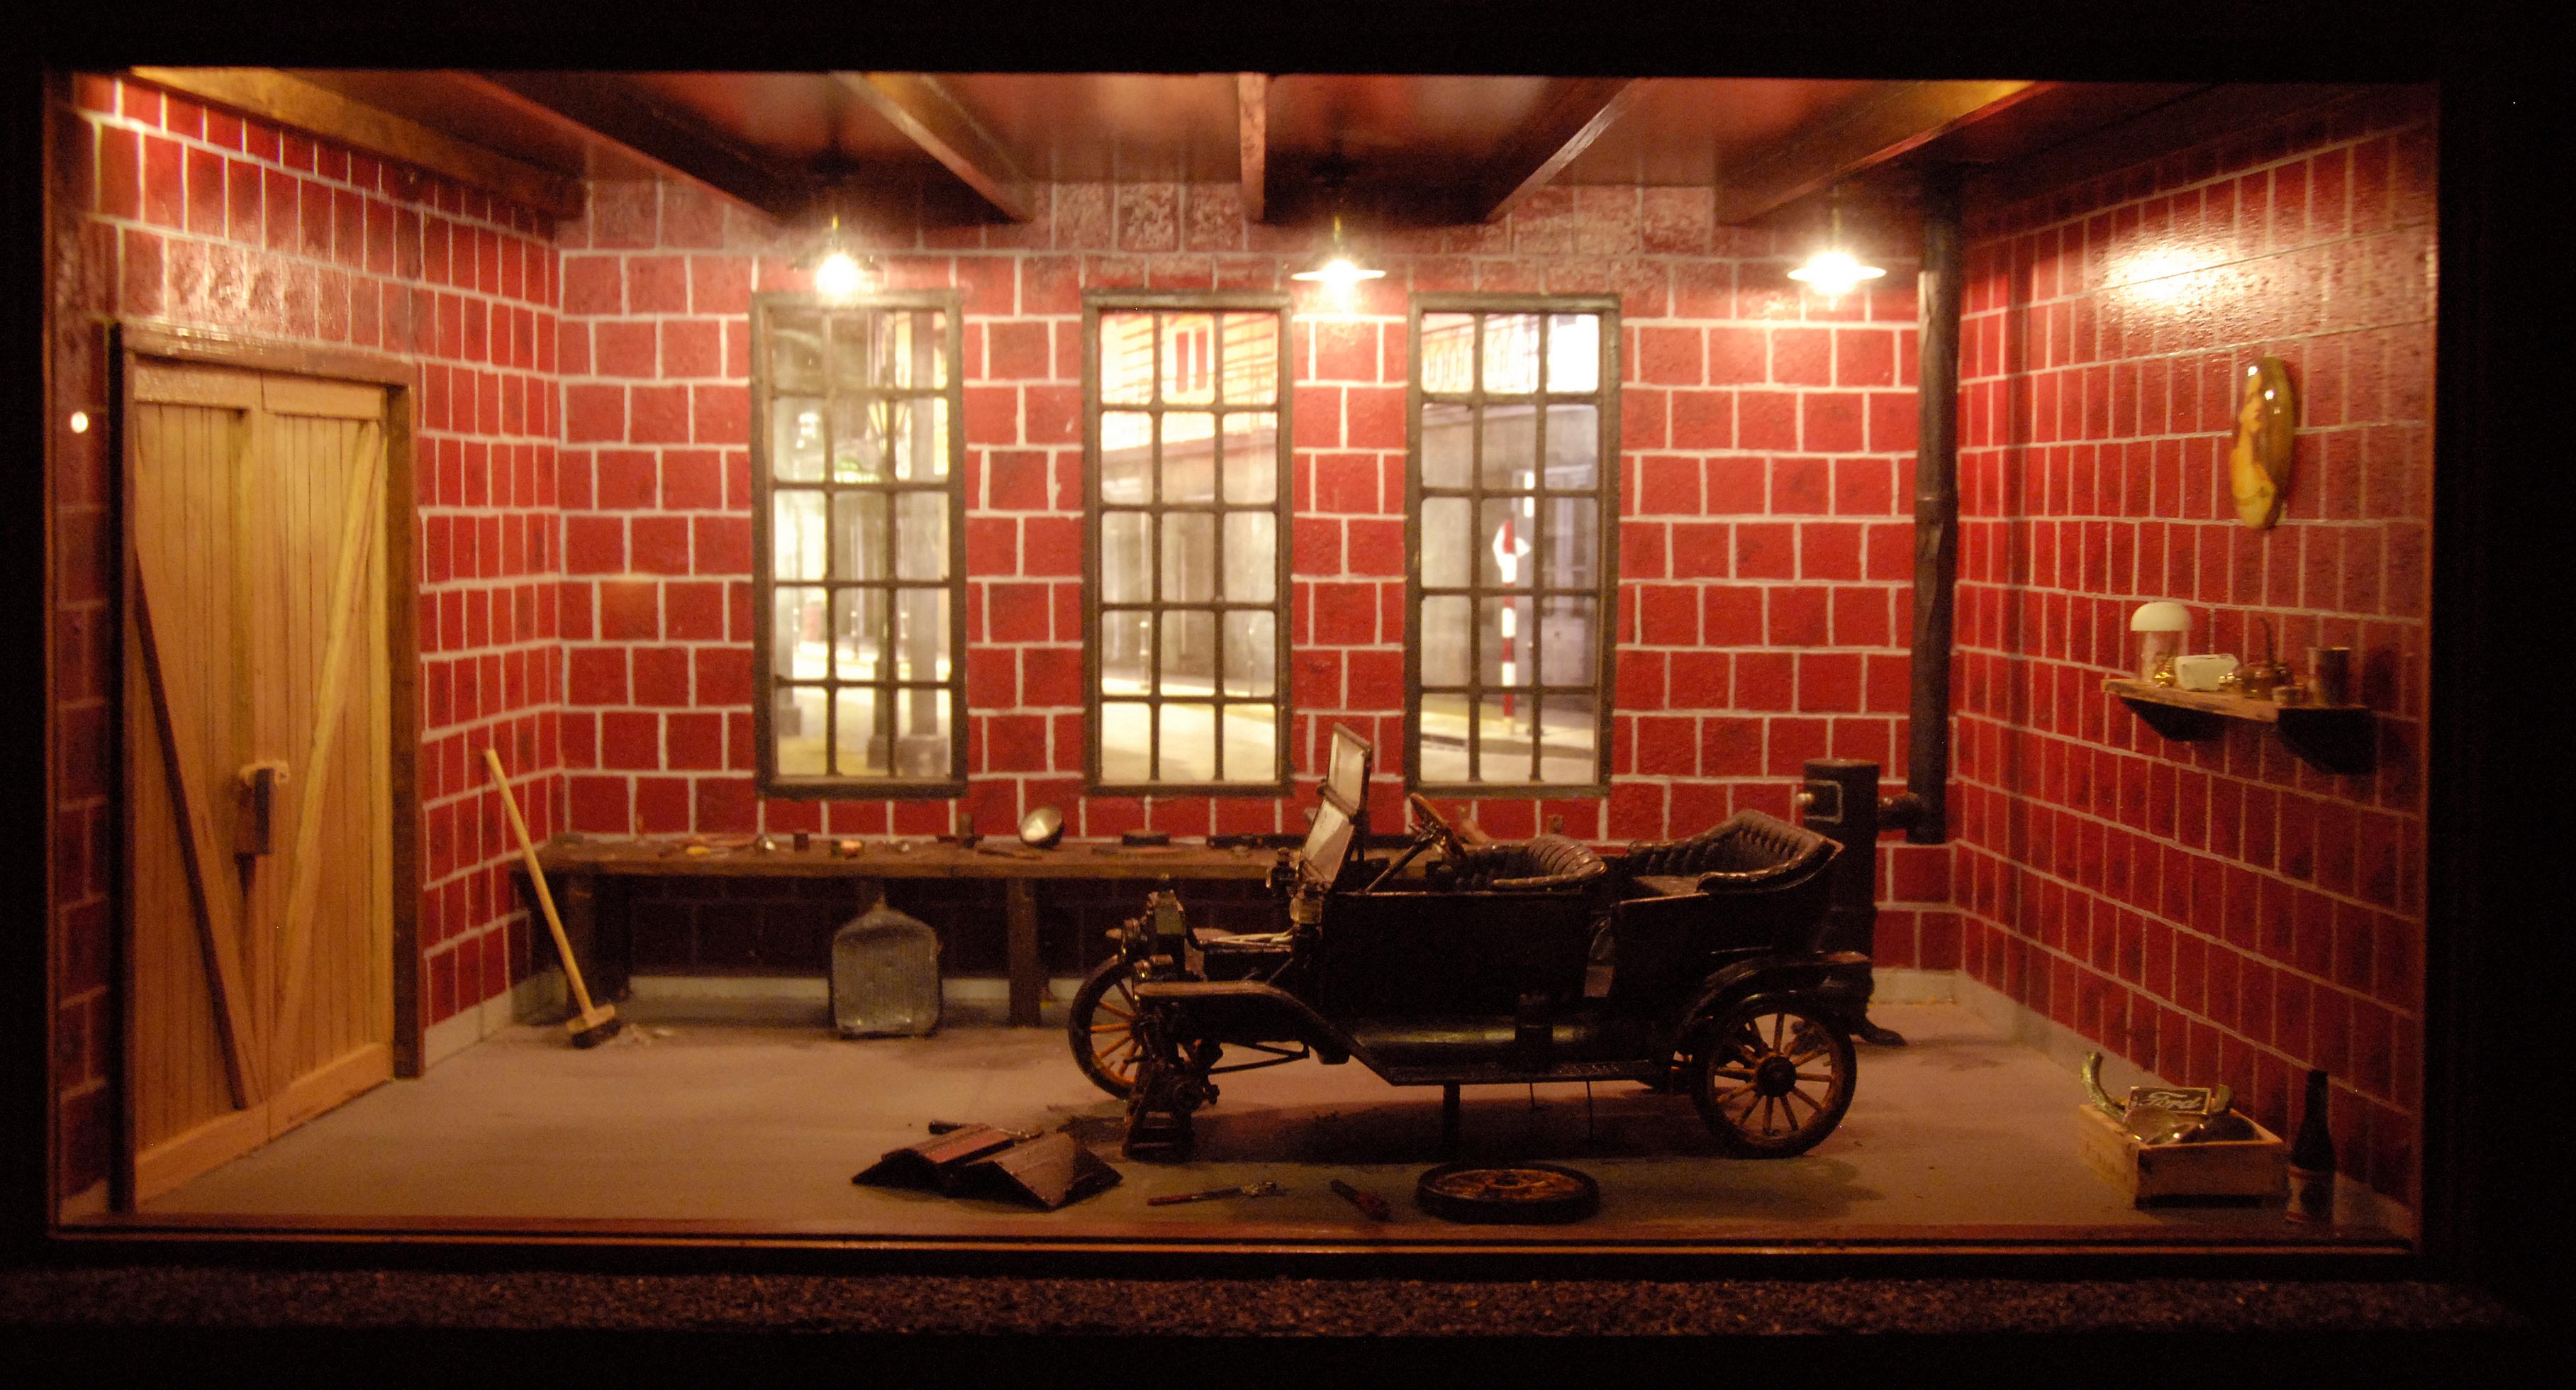 Particuliere garage 1926 - Fantasiorama - The Art of ...